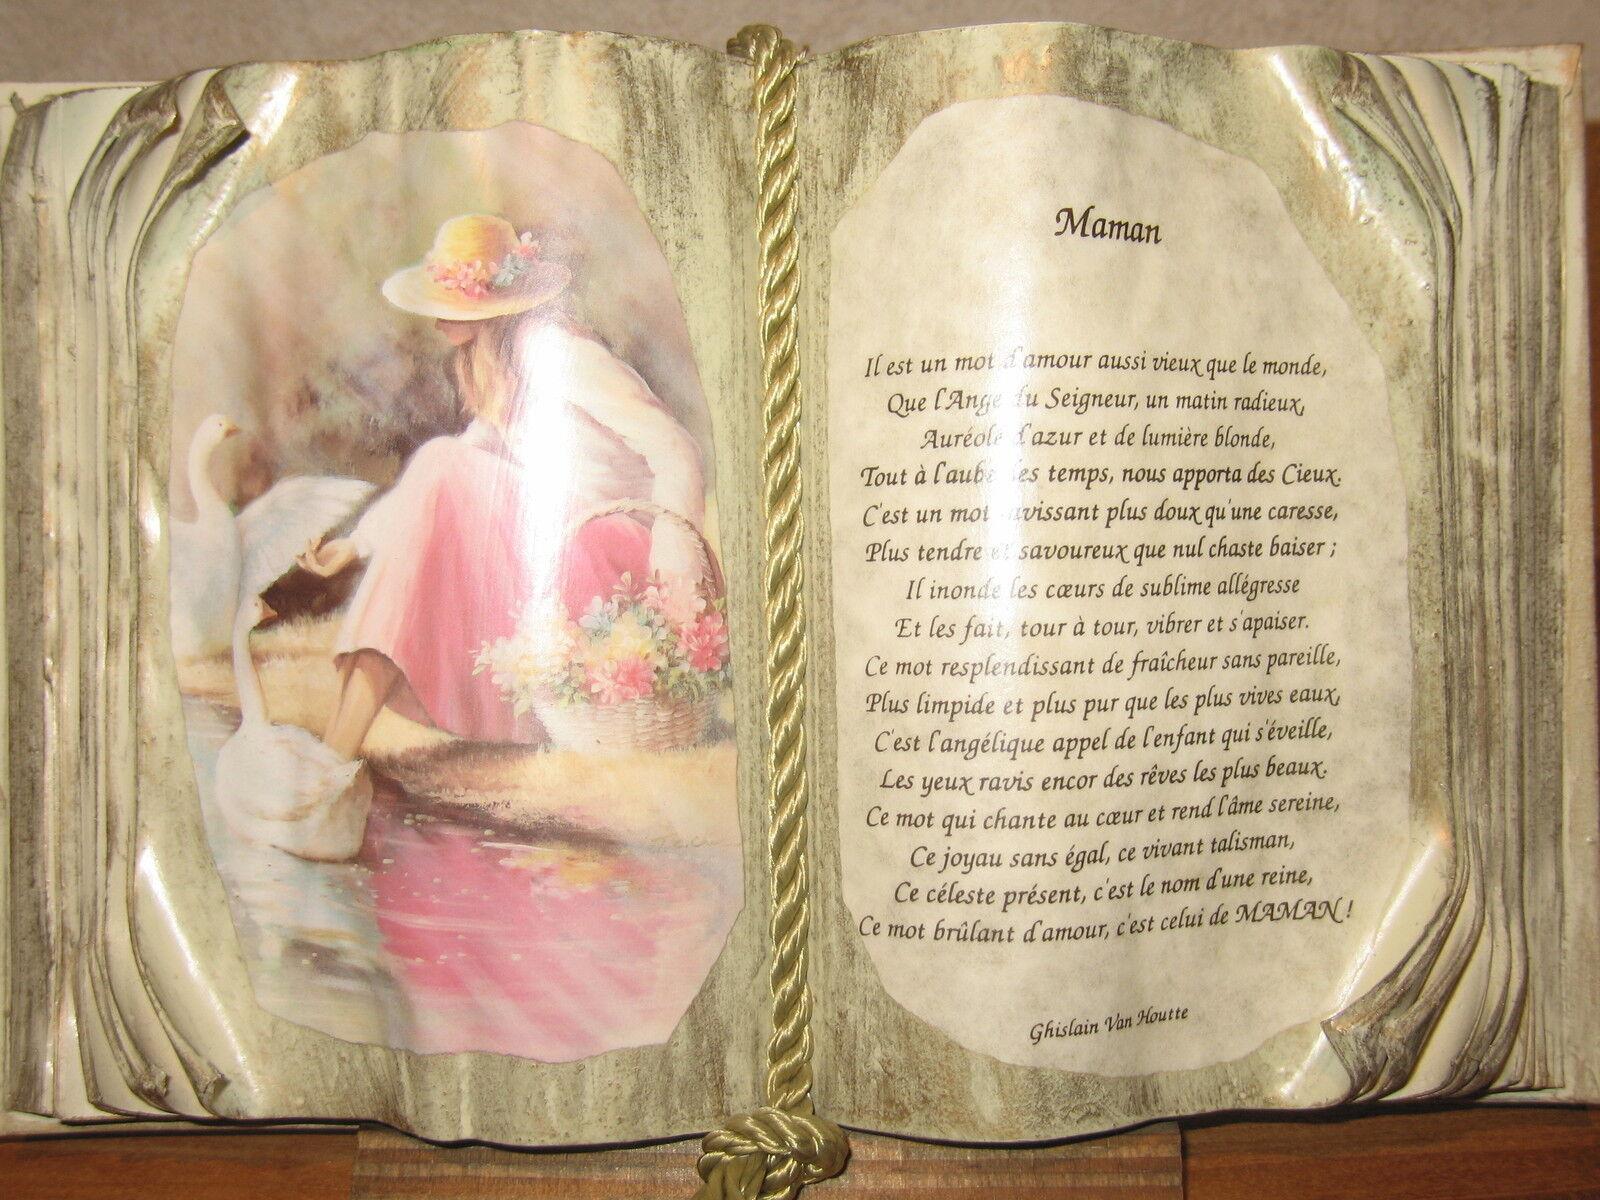 NEW Cadre Livre MAMAN H.20cm L.30cm Ghislain Van Houtte